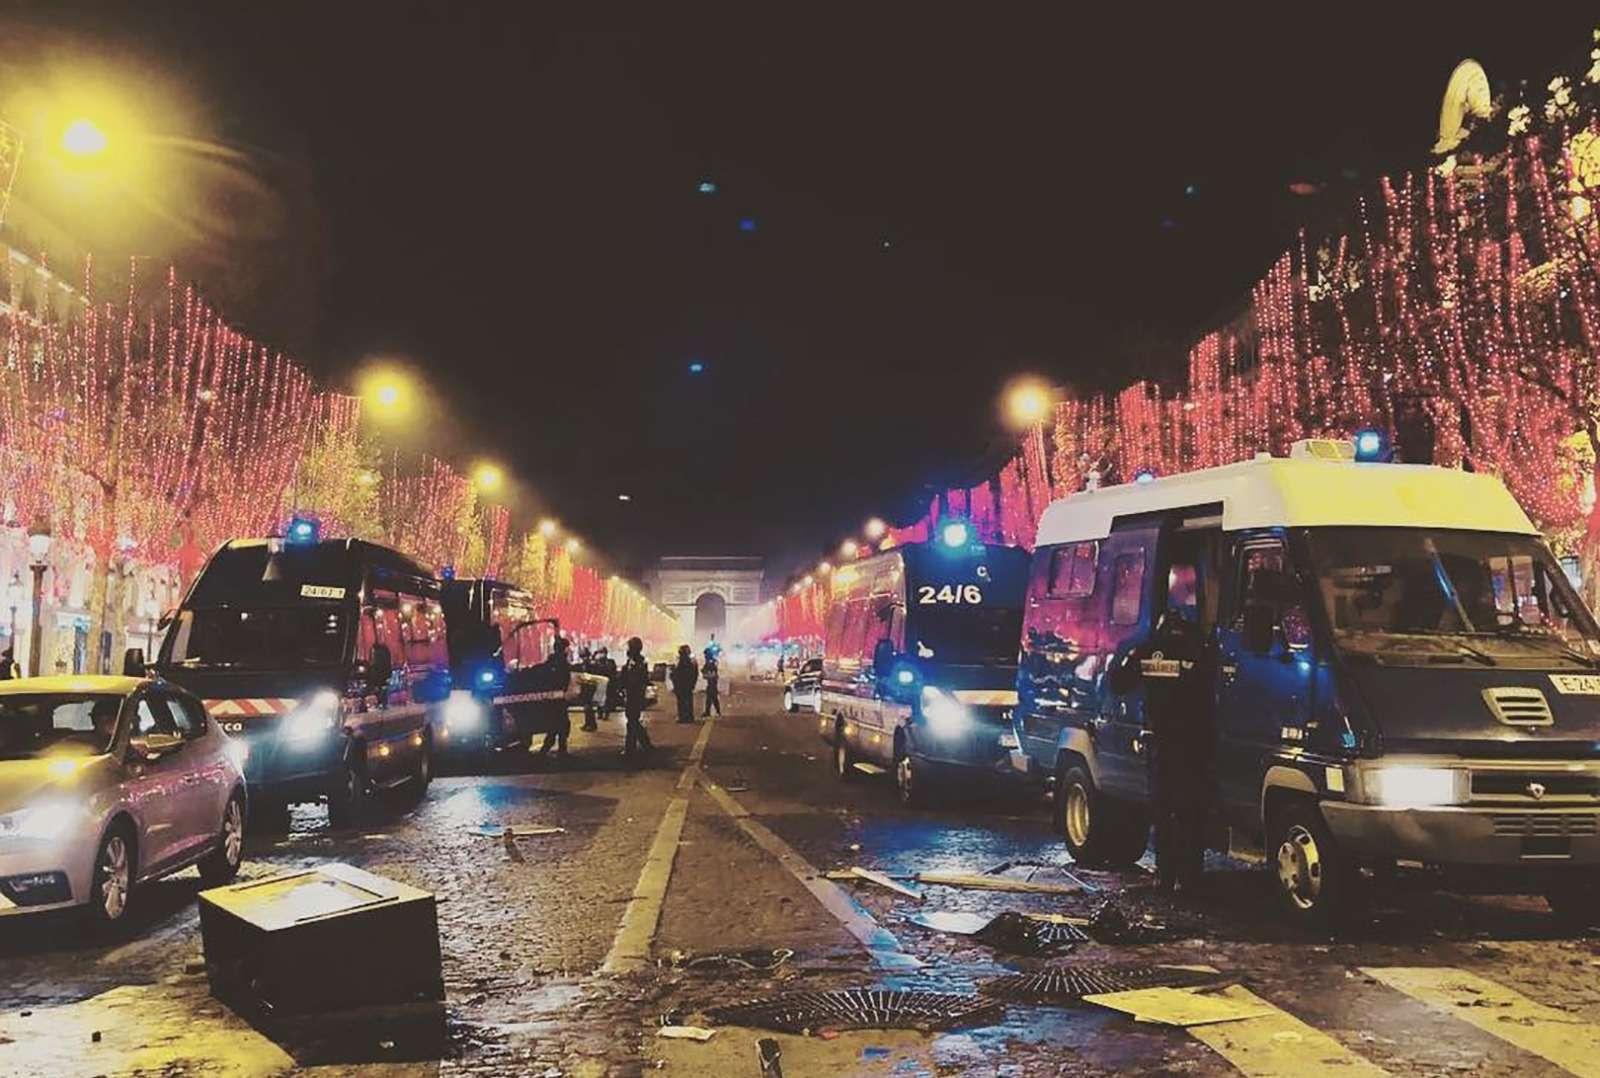 Какфранцузы протестуют против роста цен натопливо: баррикады против водометов— фото 926160